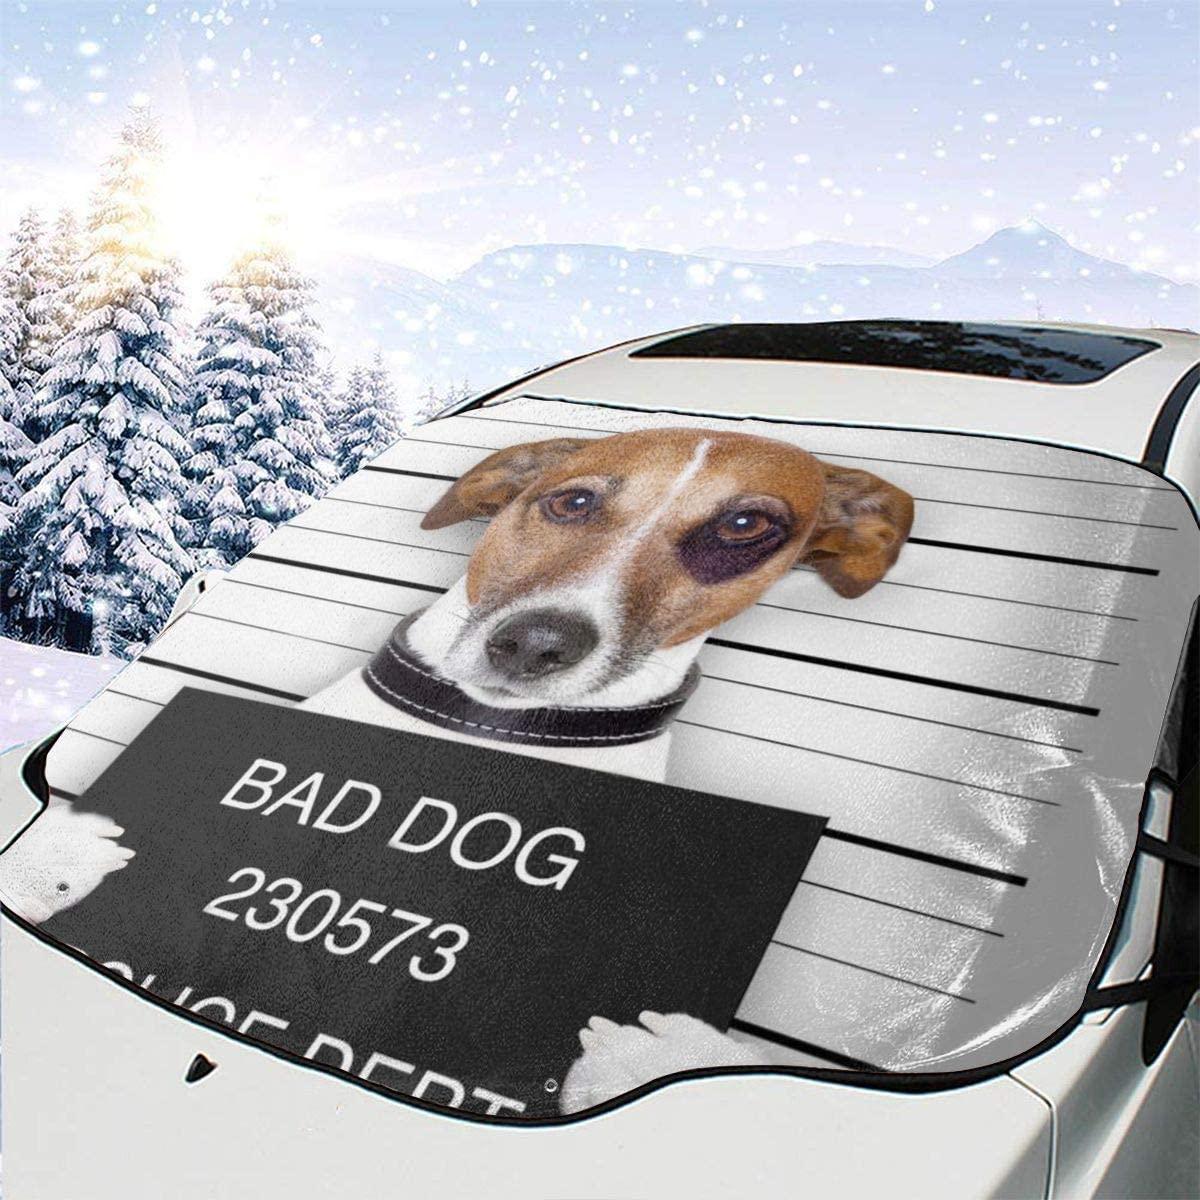 THONFIRE Car Front Window Windshields Ice Sunshade Bad Dog Cover Sand Proof Blocks UV Rays Damage Free Visor Protector Trucks Summer Heat Reflector